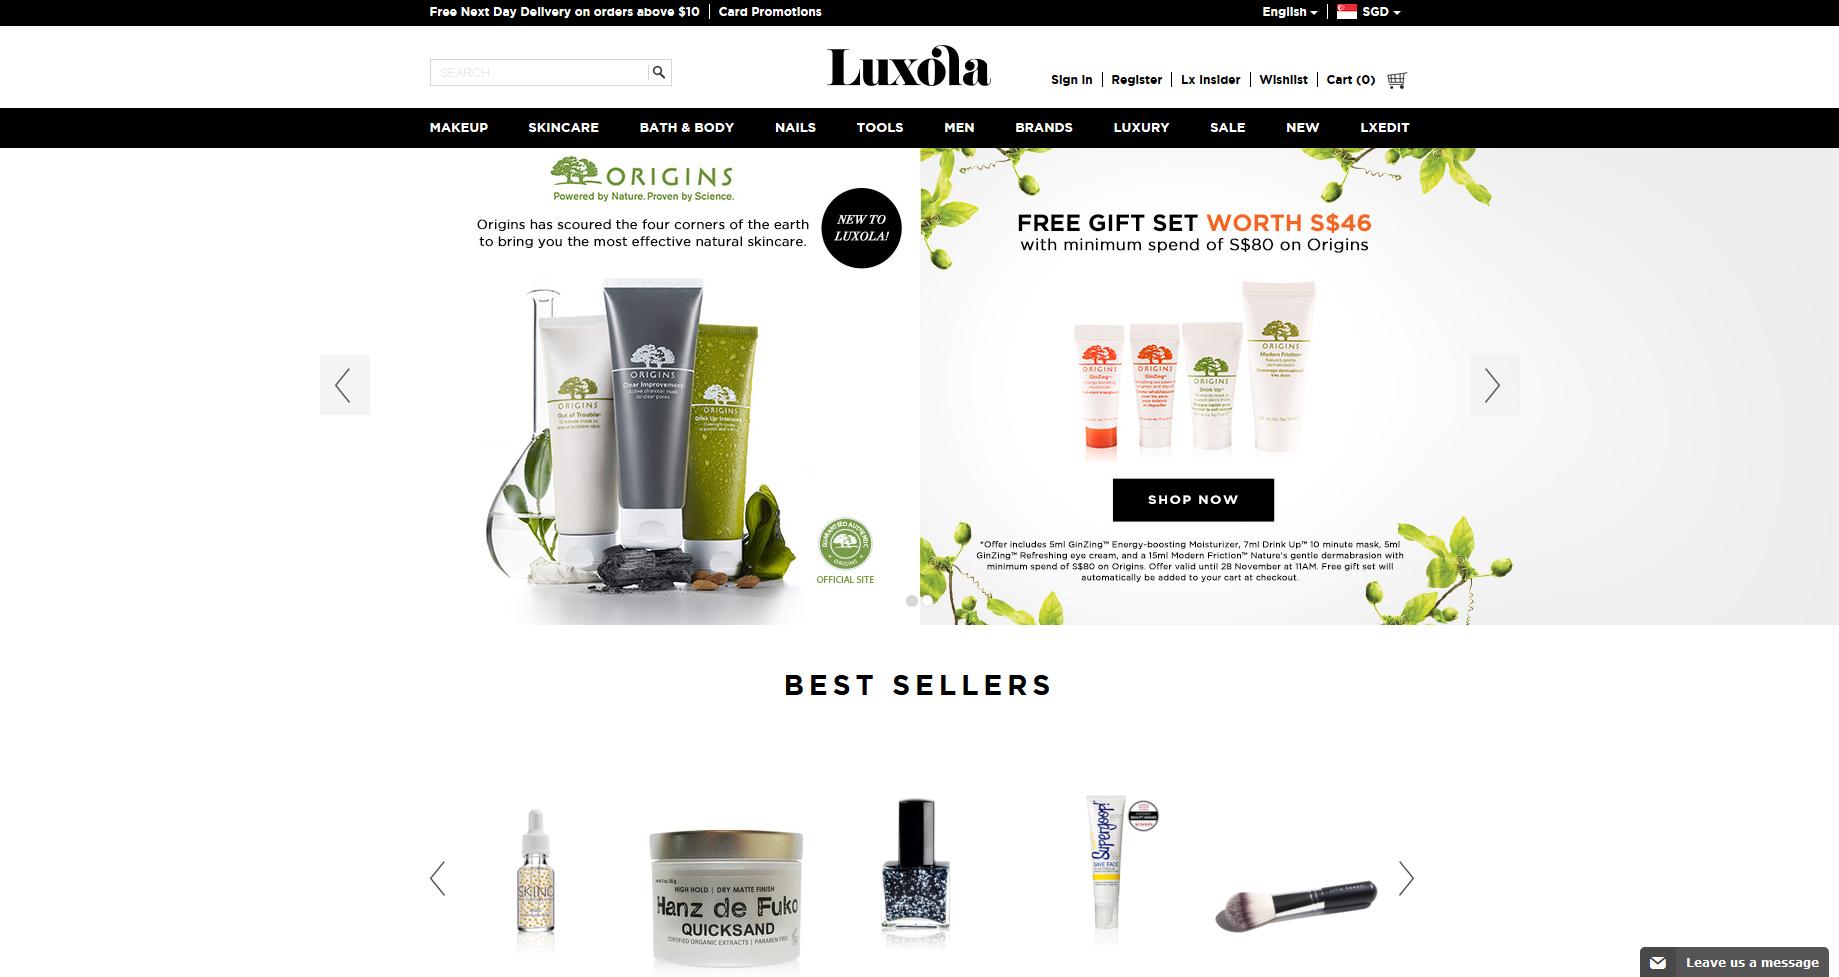 Luxola